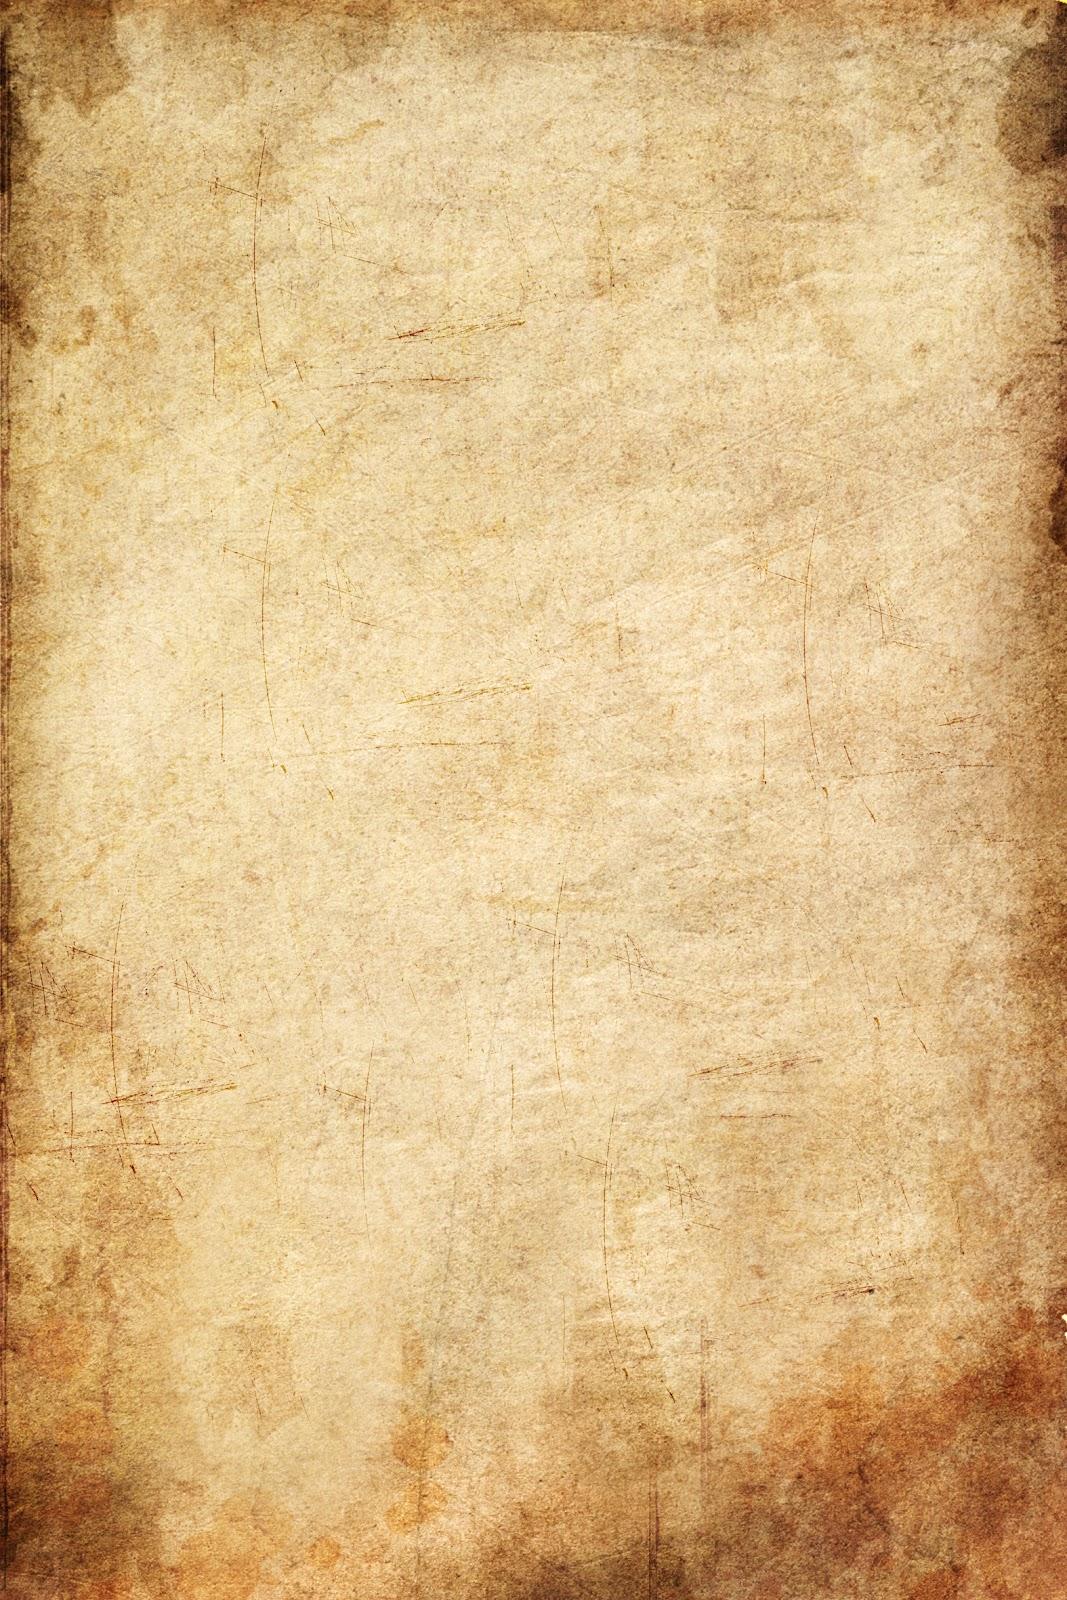 Free PSD Store: Vintage Grunge Textures